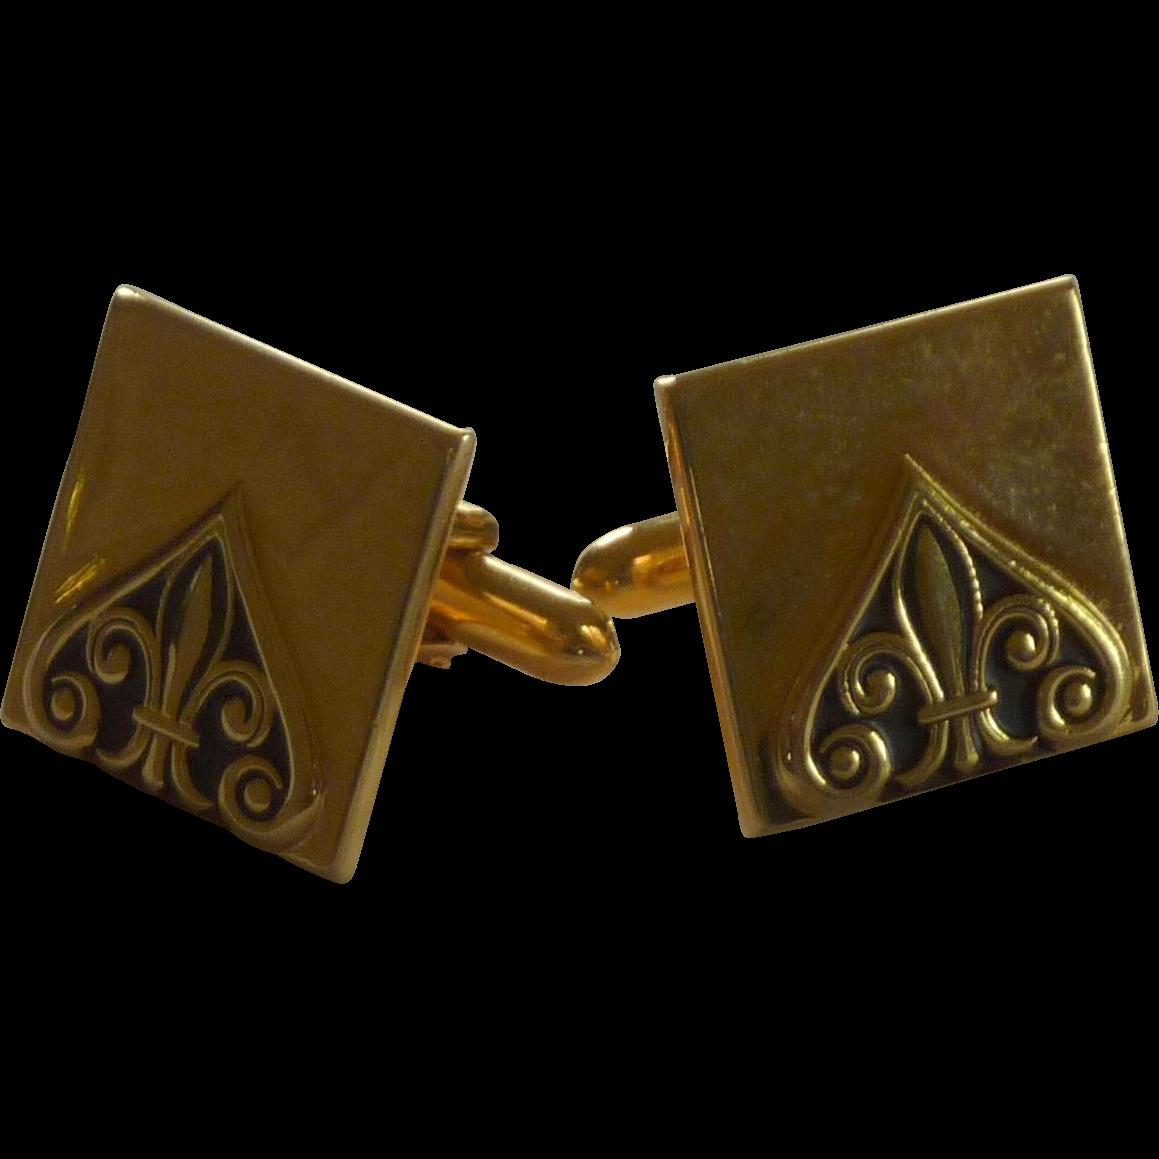 Swank Gold Tone Square Fleur De Lis Design Cuff Links Cufflinks